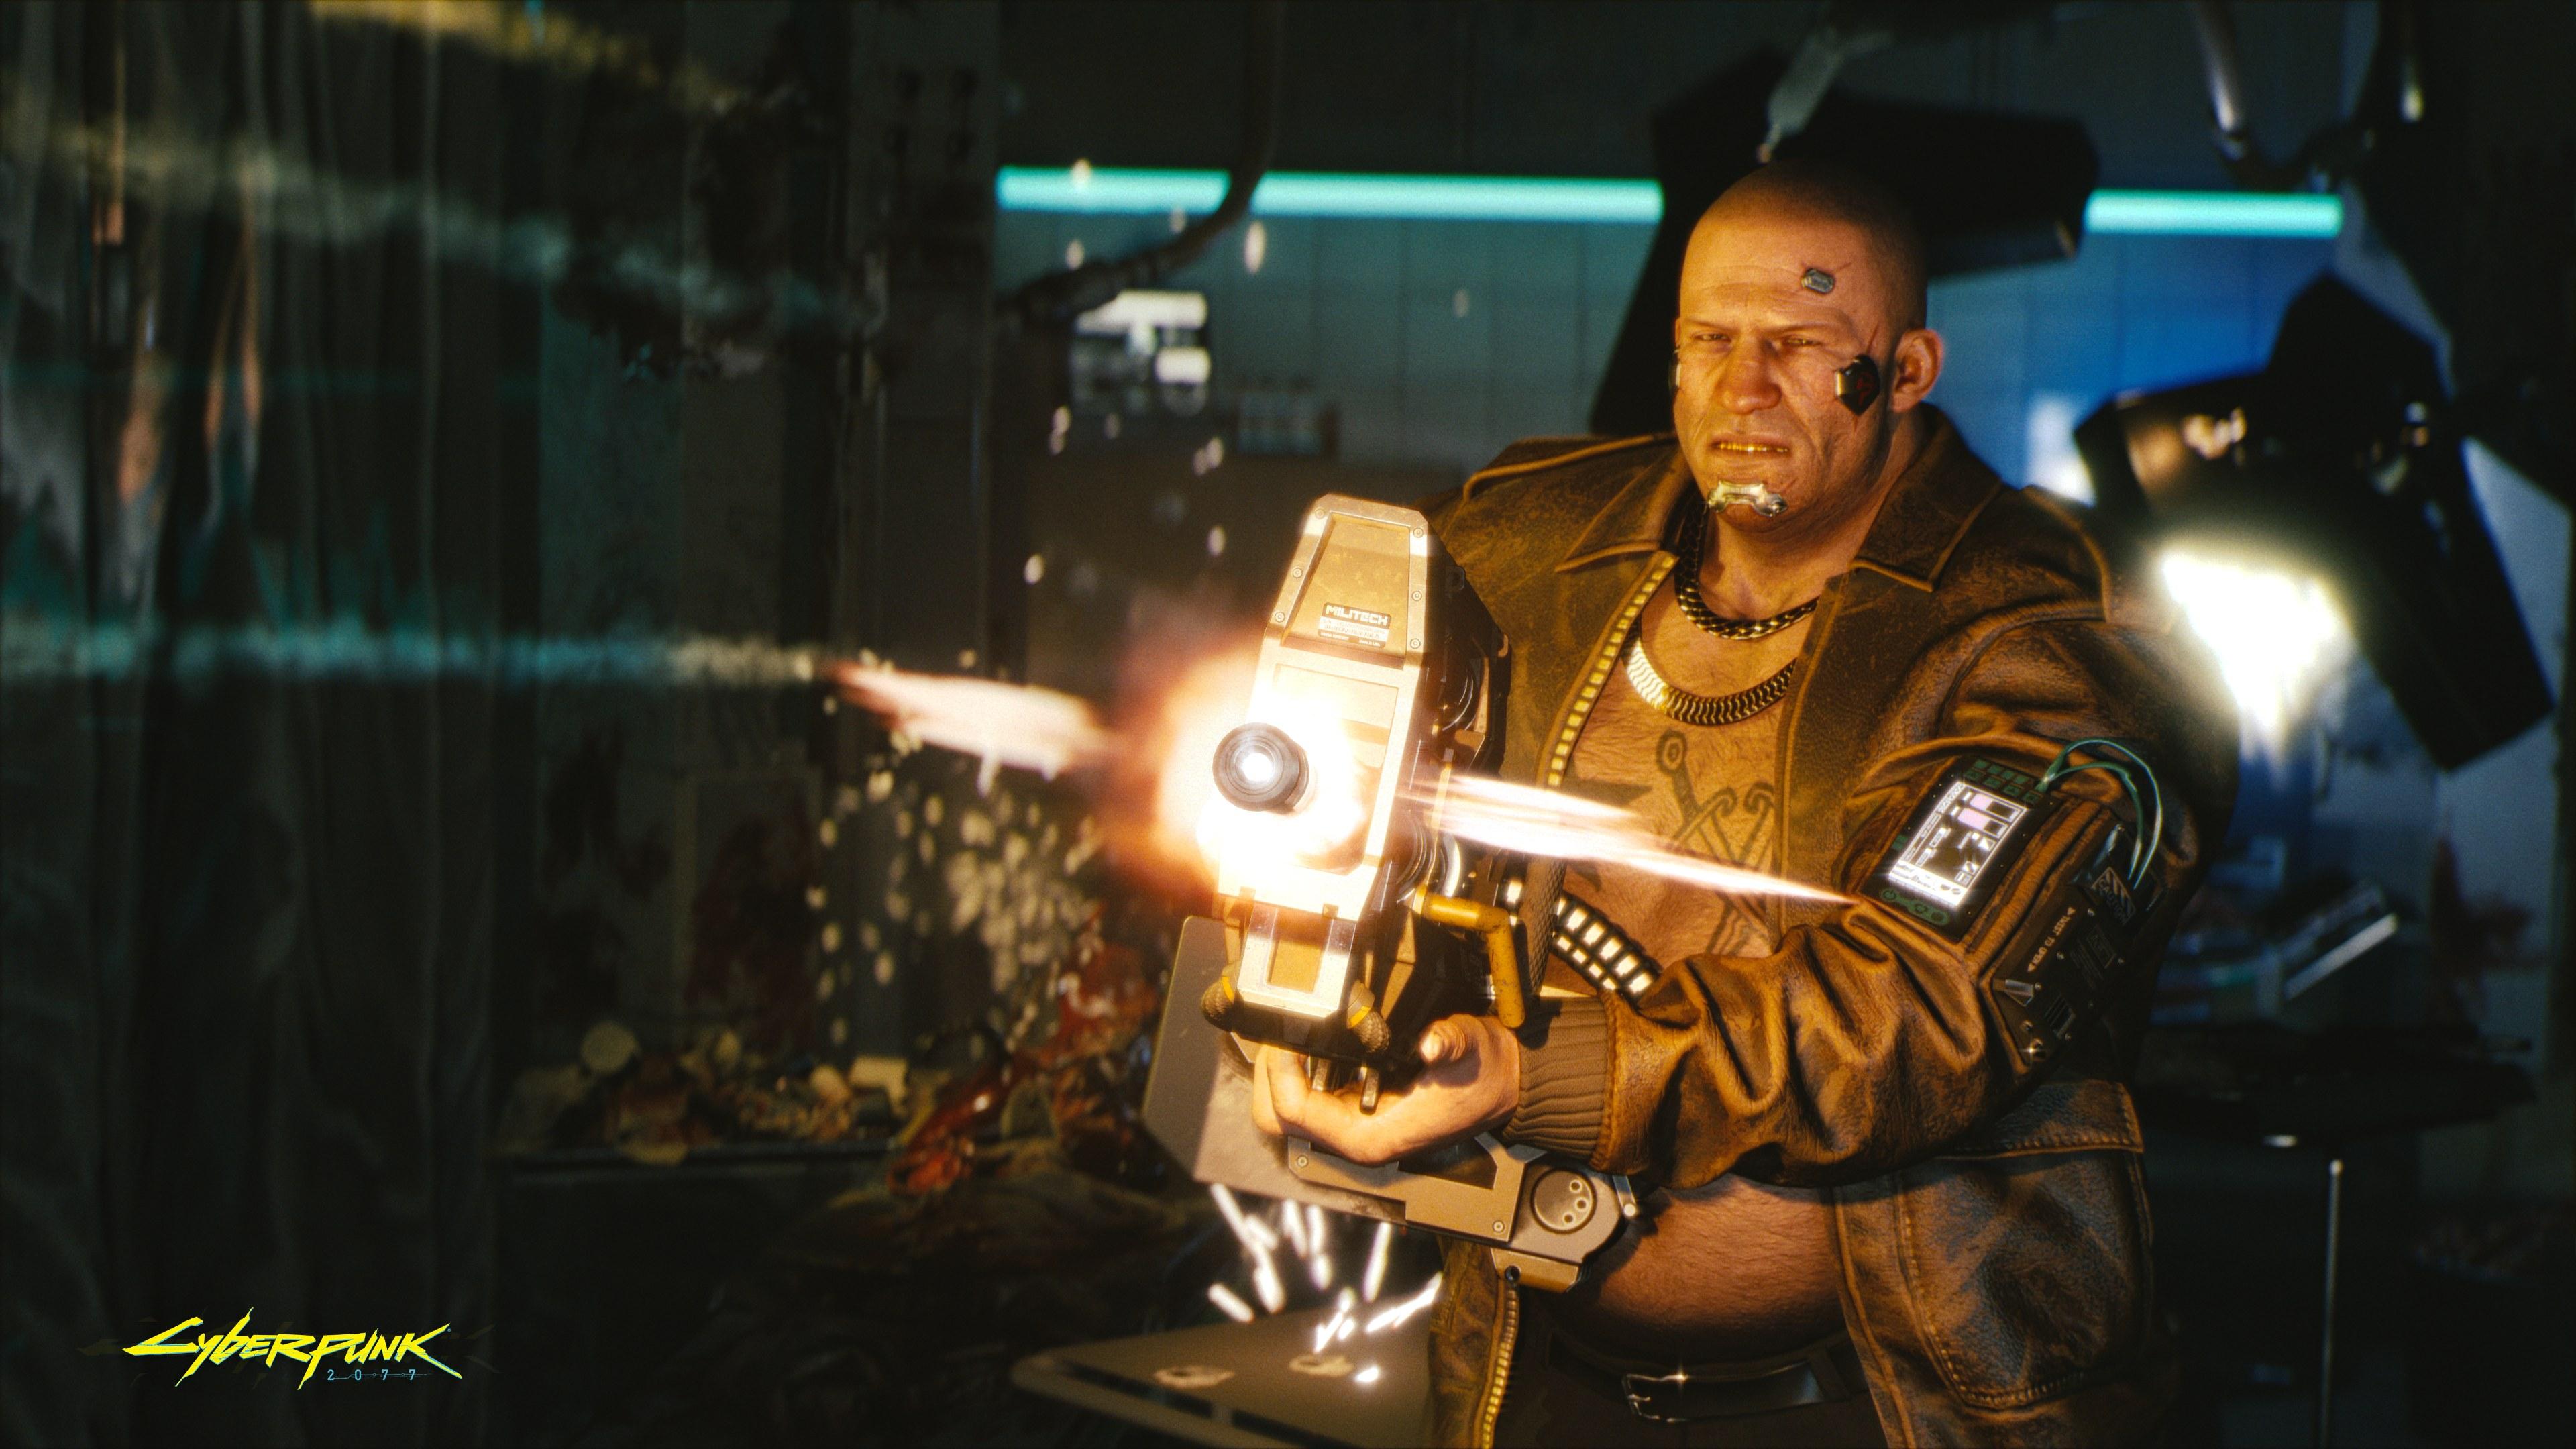 A big man with a big gun, lit by muzzle flash.